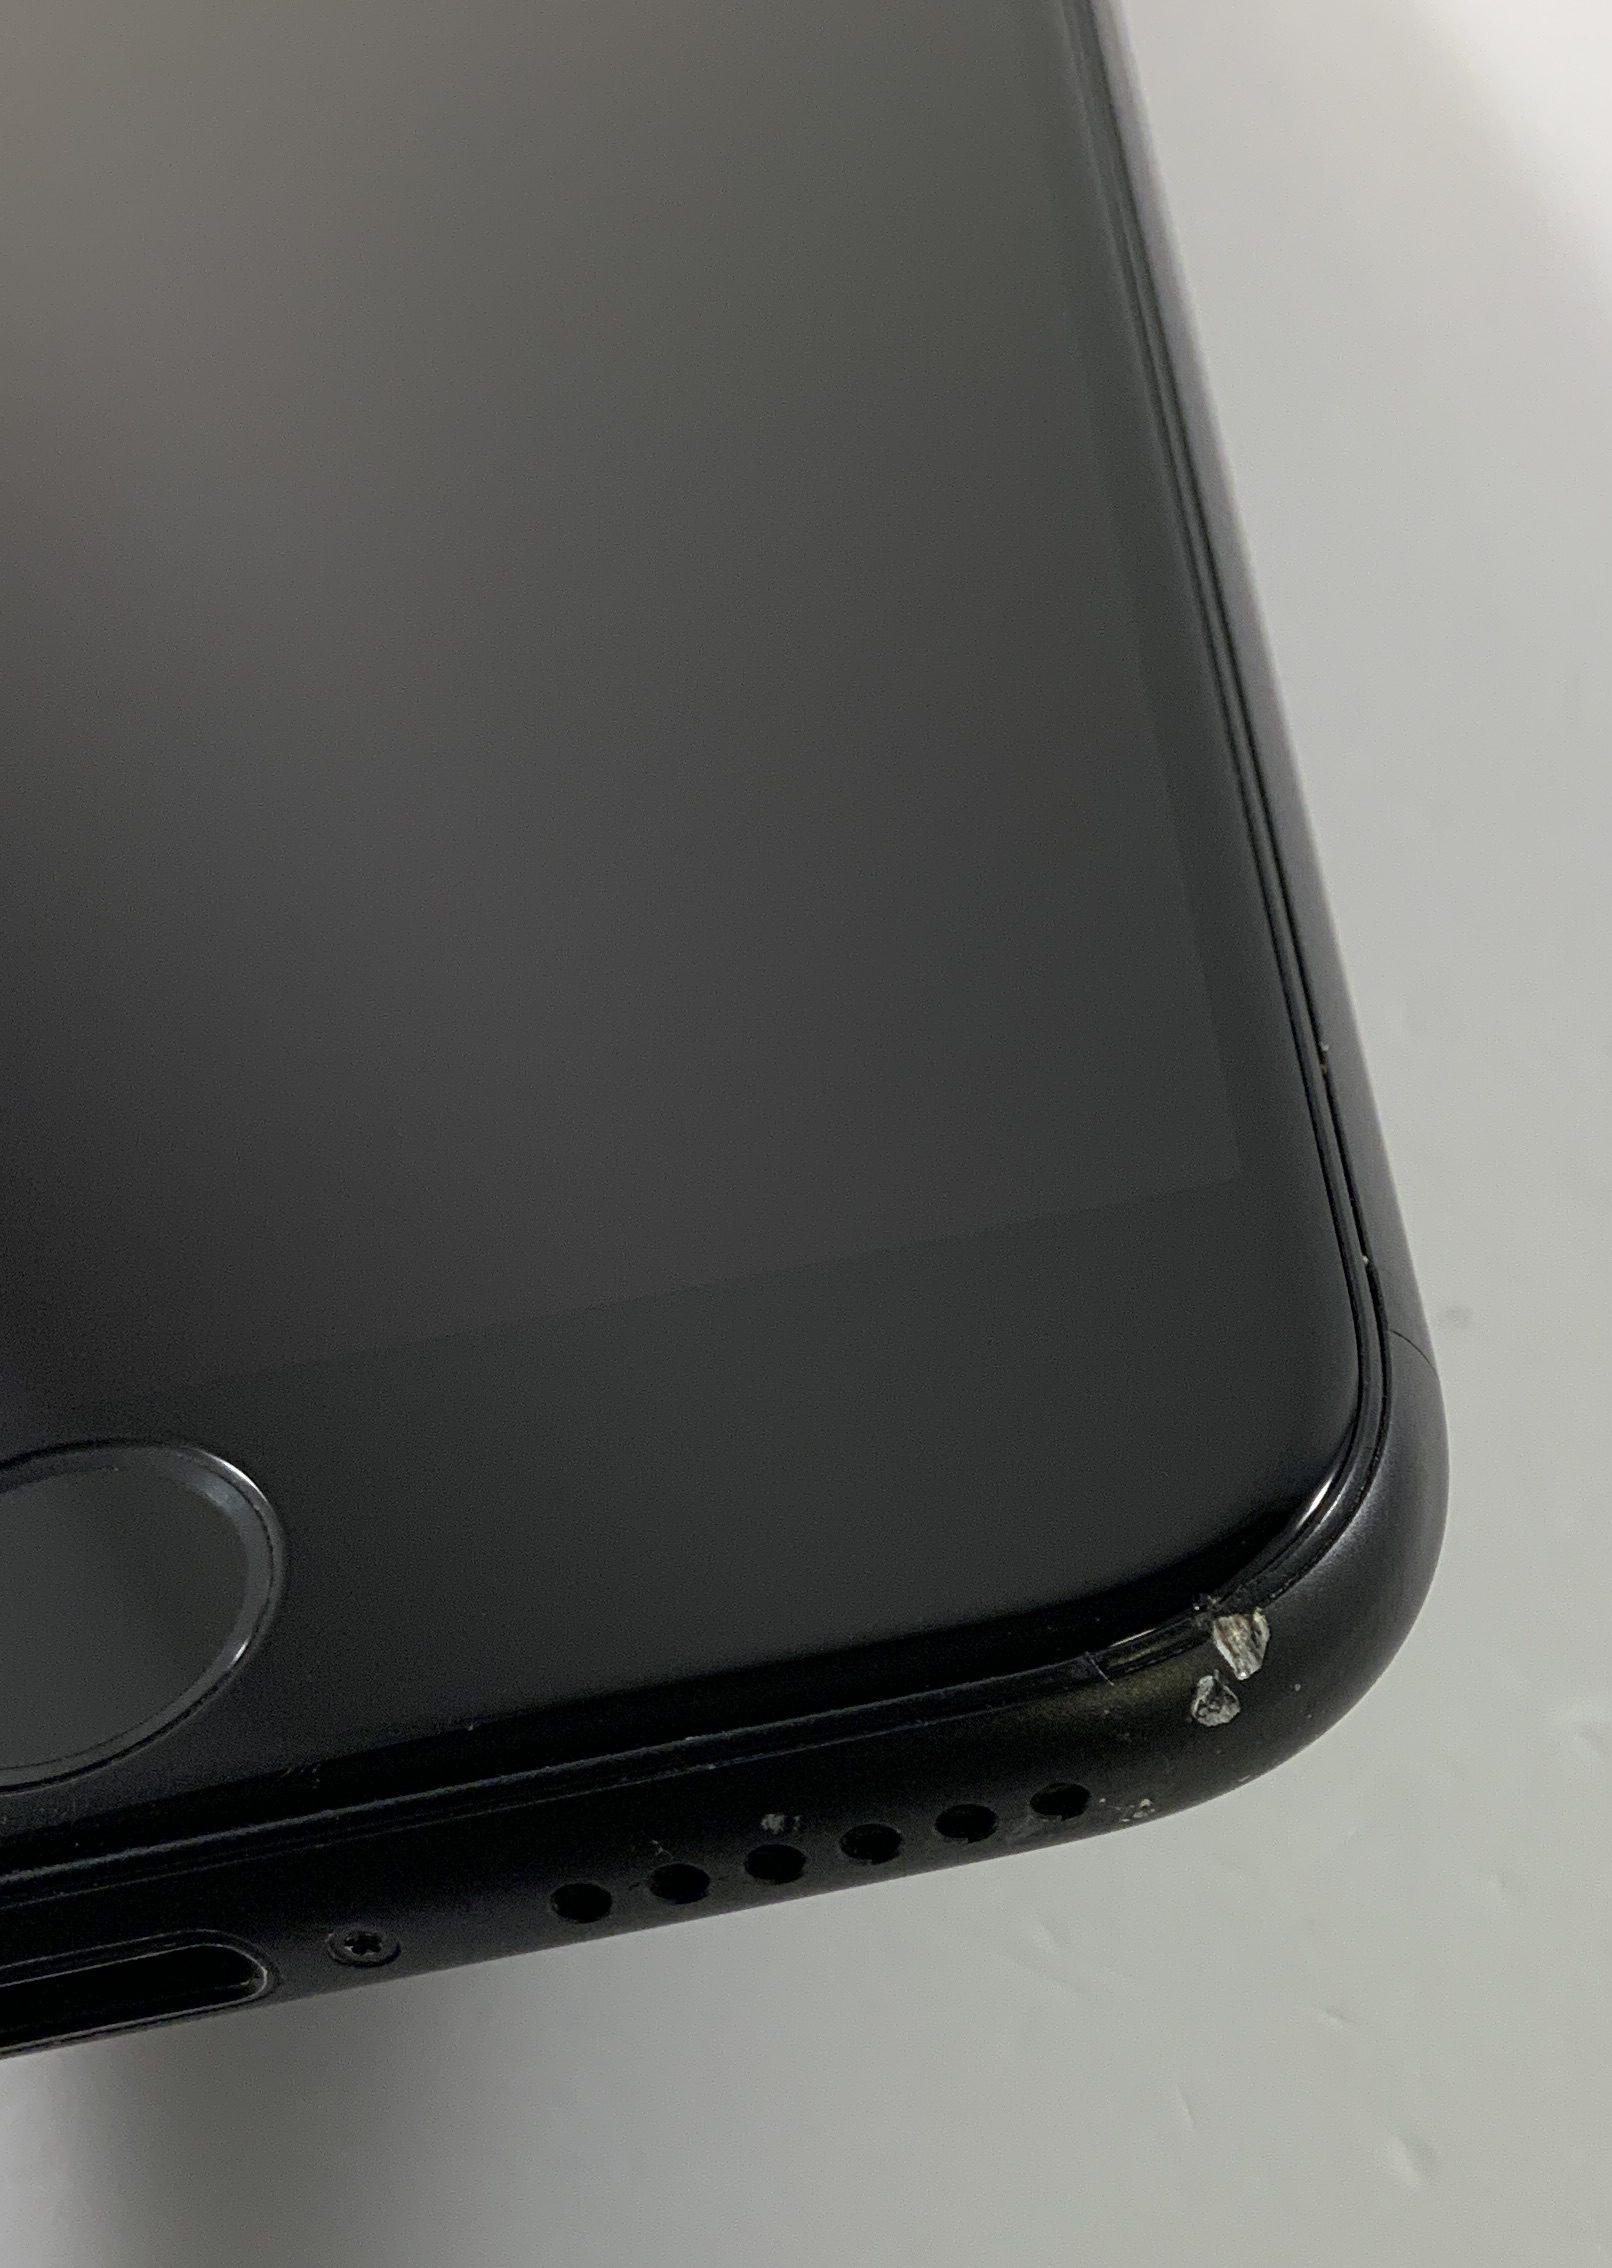 iPhone 7 128GB, 128GB, Black, bild 5